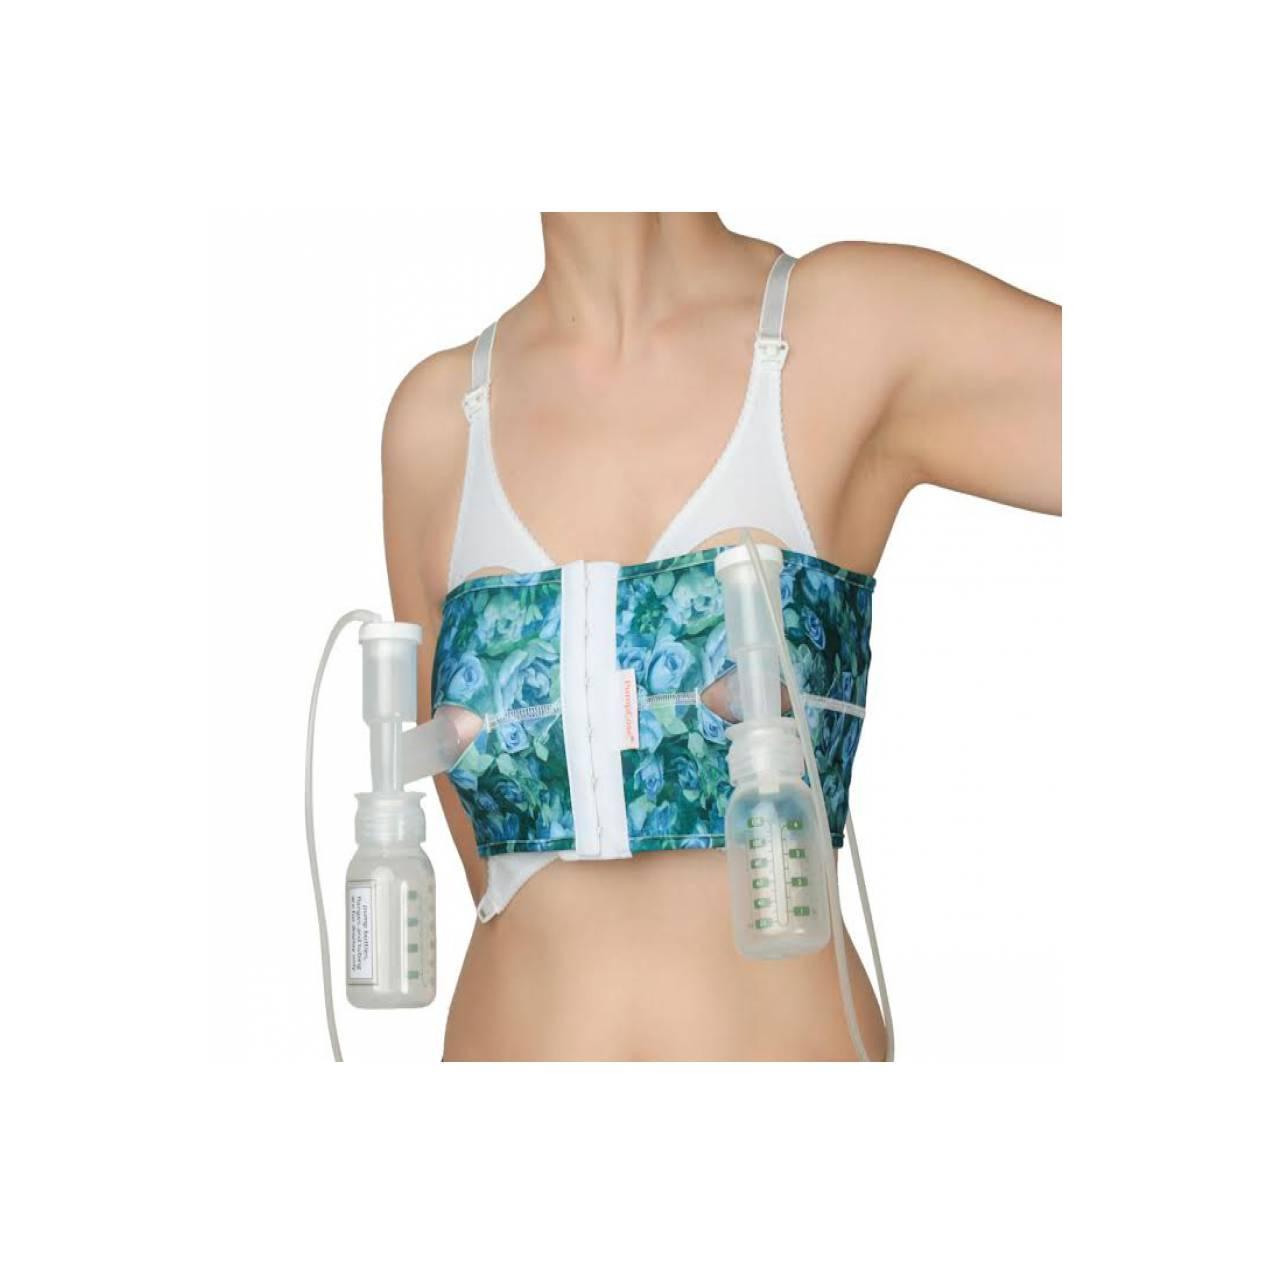 Pumpease Handsfree pumping bra Royal Bloom